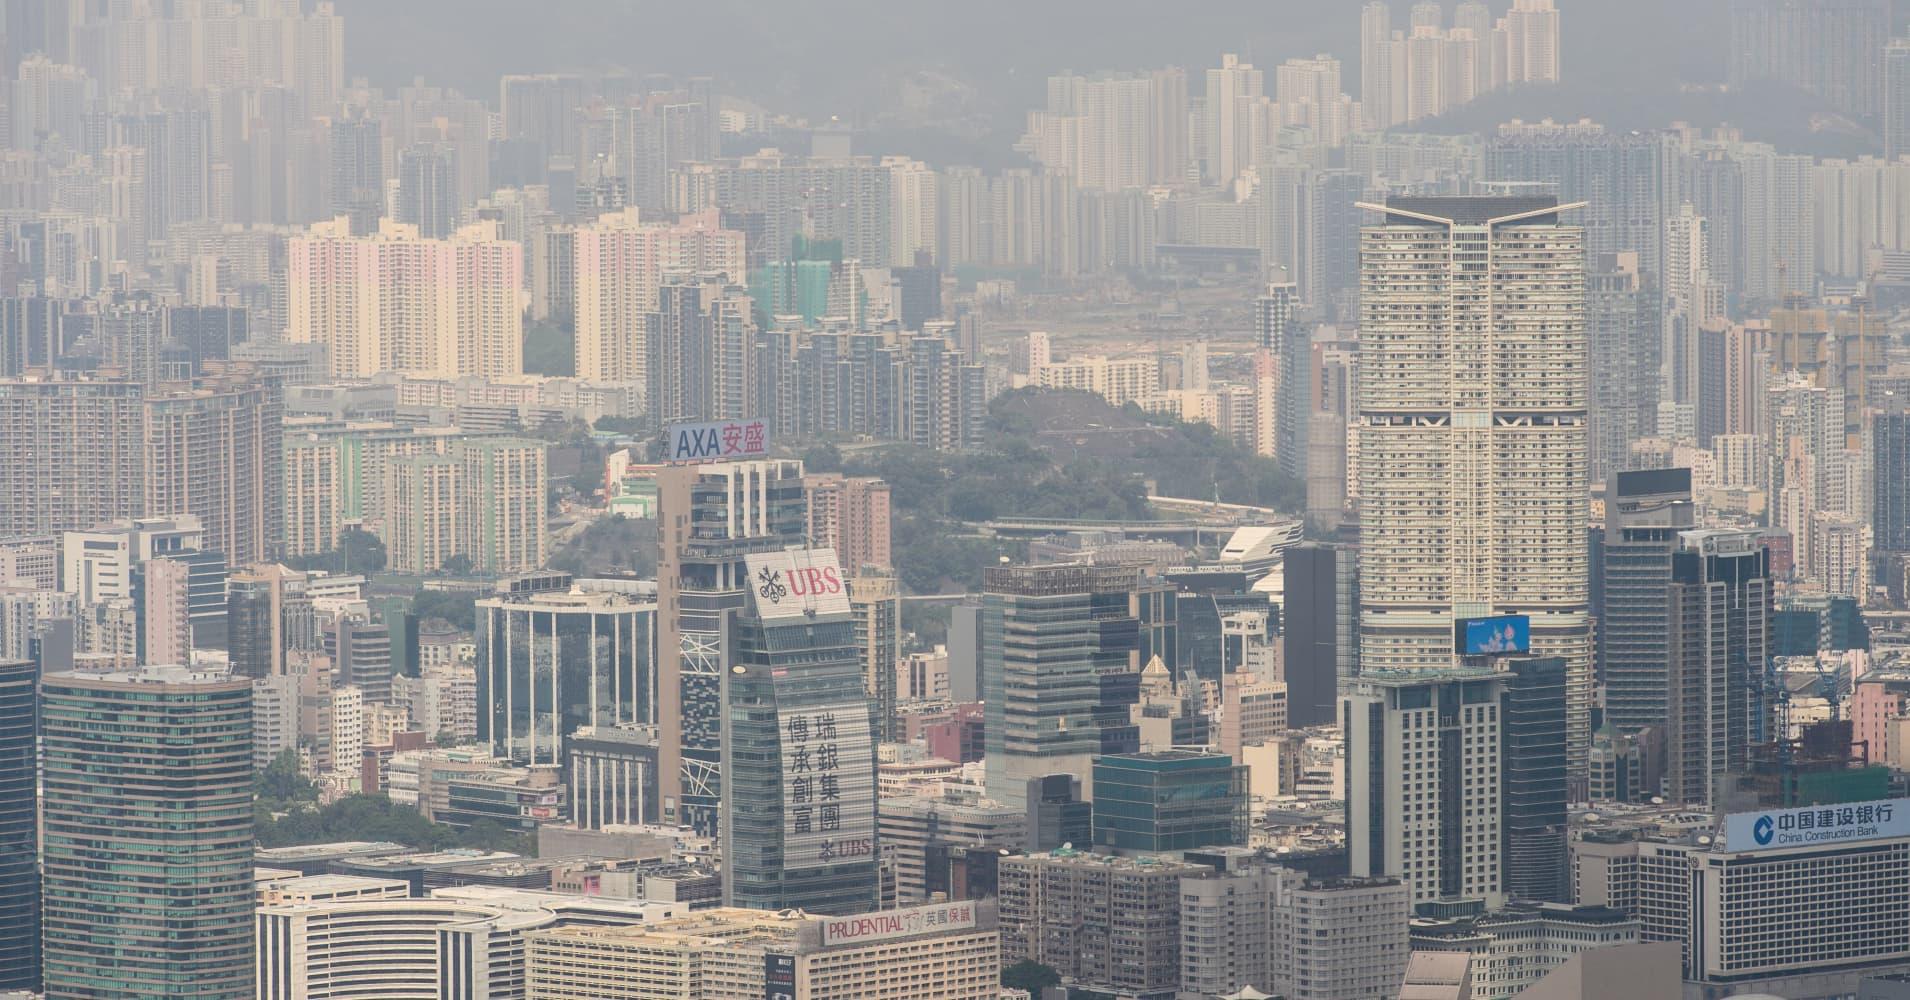 Hong Kong tops 'economic freedom' chart despite political pressure from Beijing